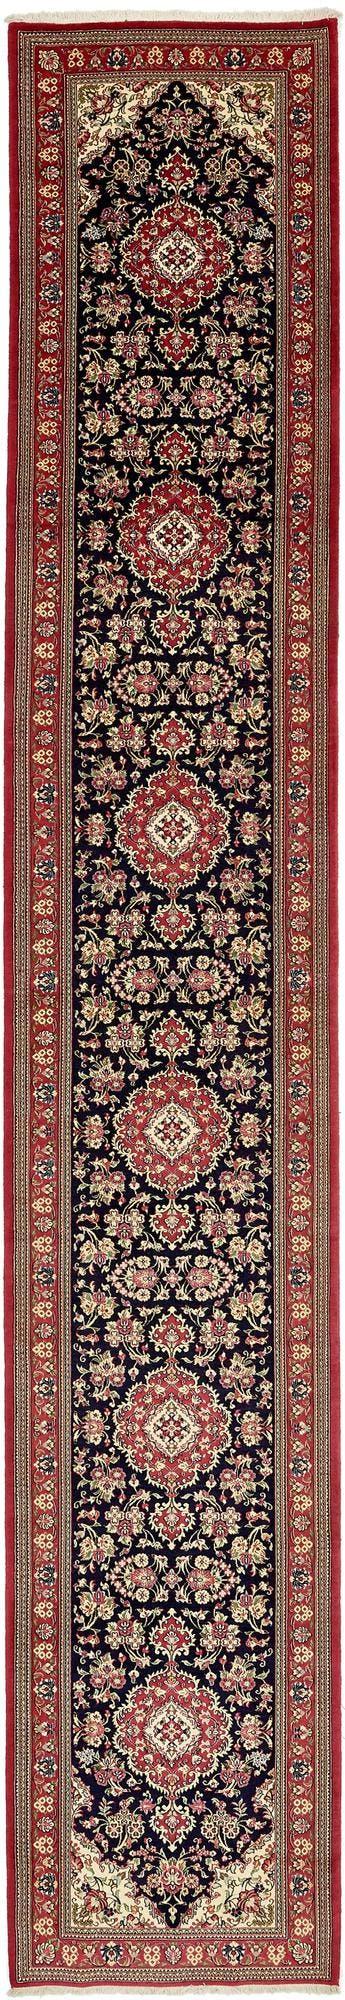 2' 7 x 16' 2 Qom Persian Rug main image